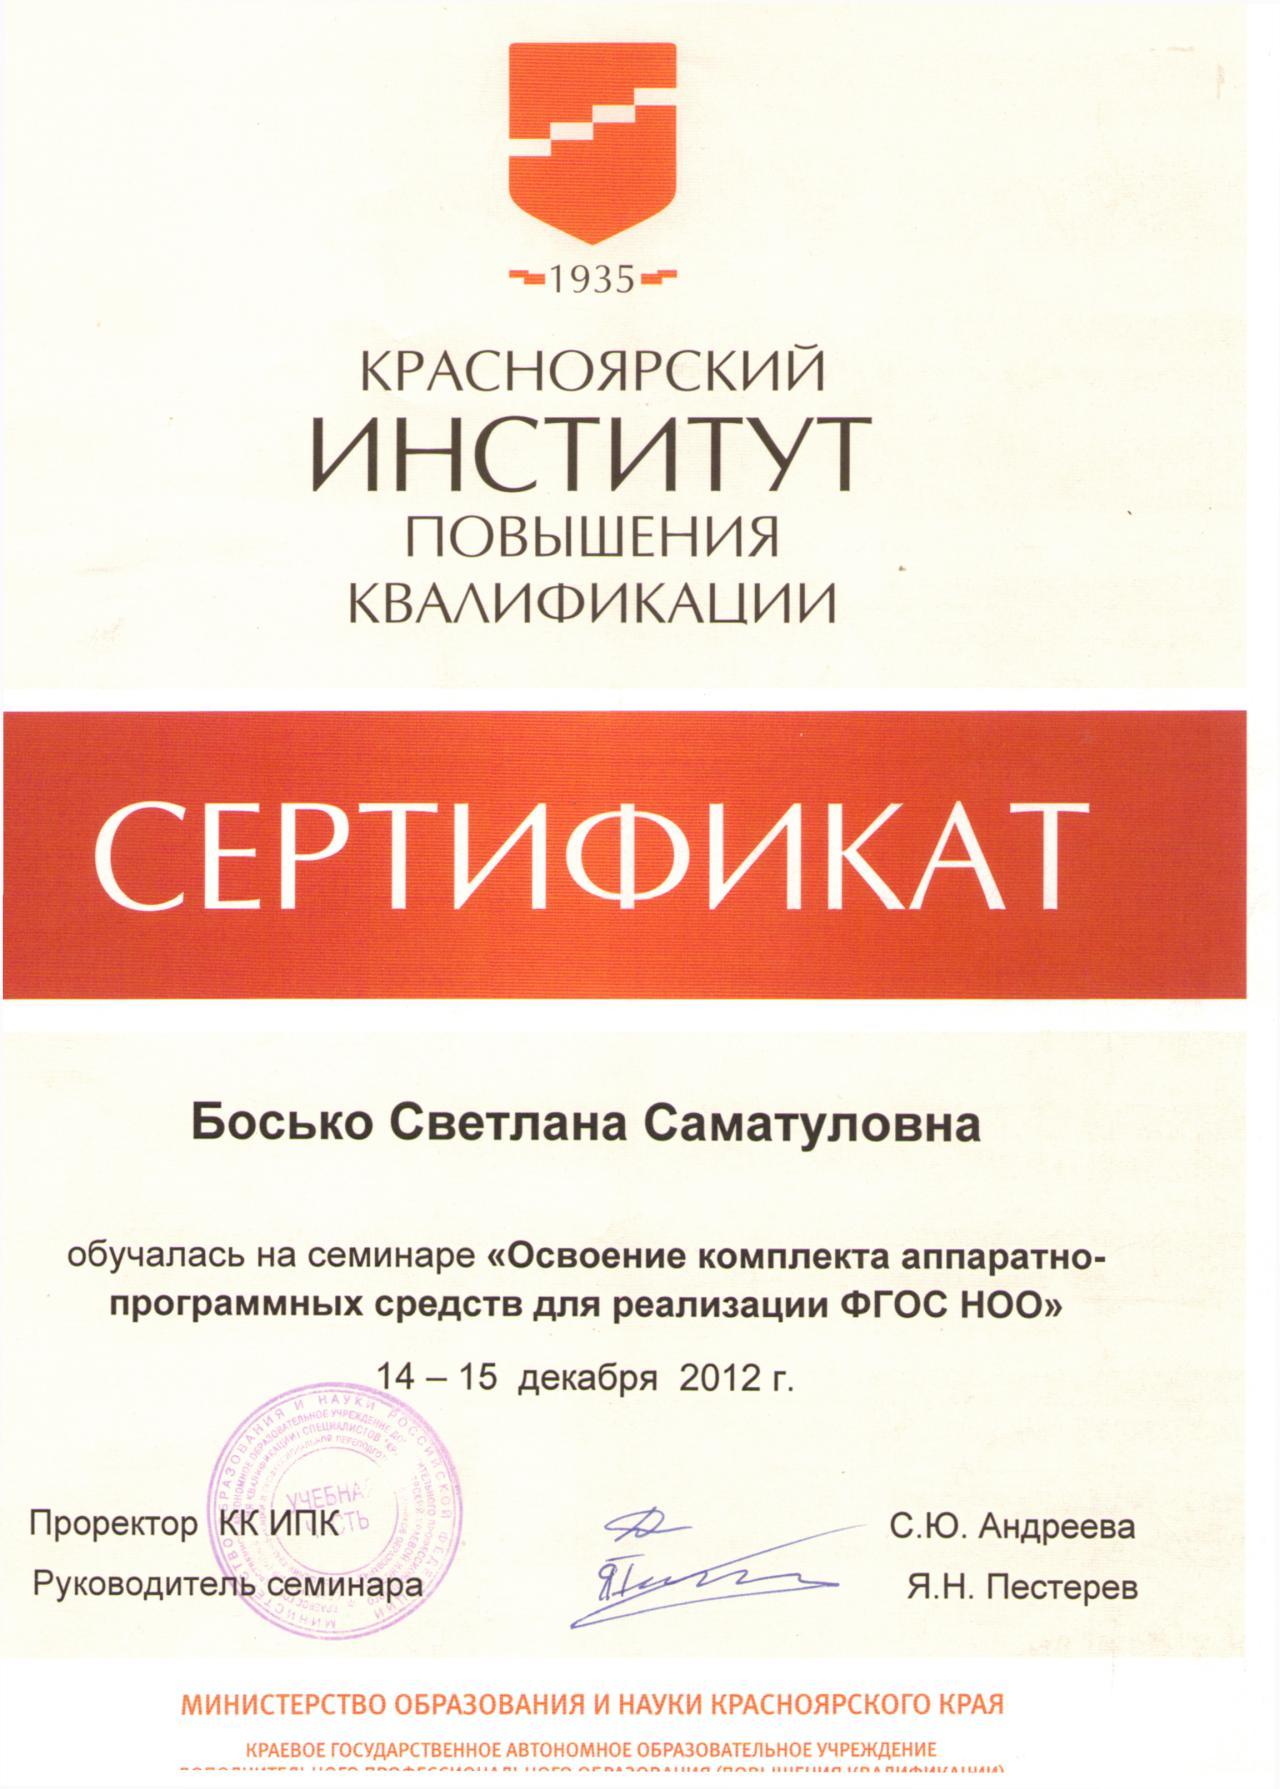 C:\Documents and Settings\Светлана Саматуловна\Рабочий стол\квалификация\12 сертиф.tif